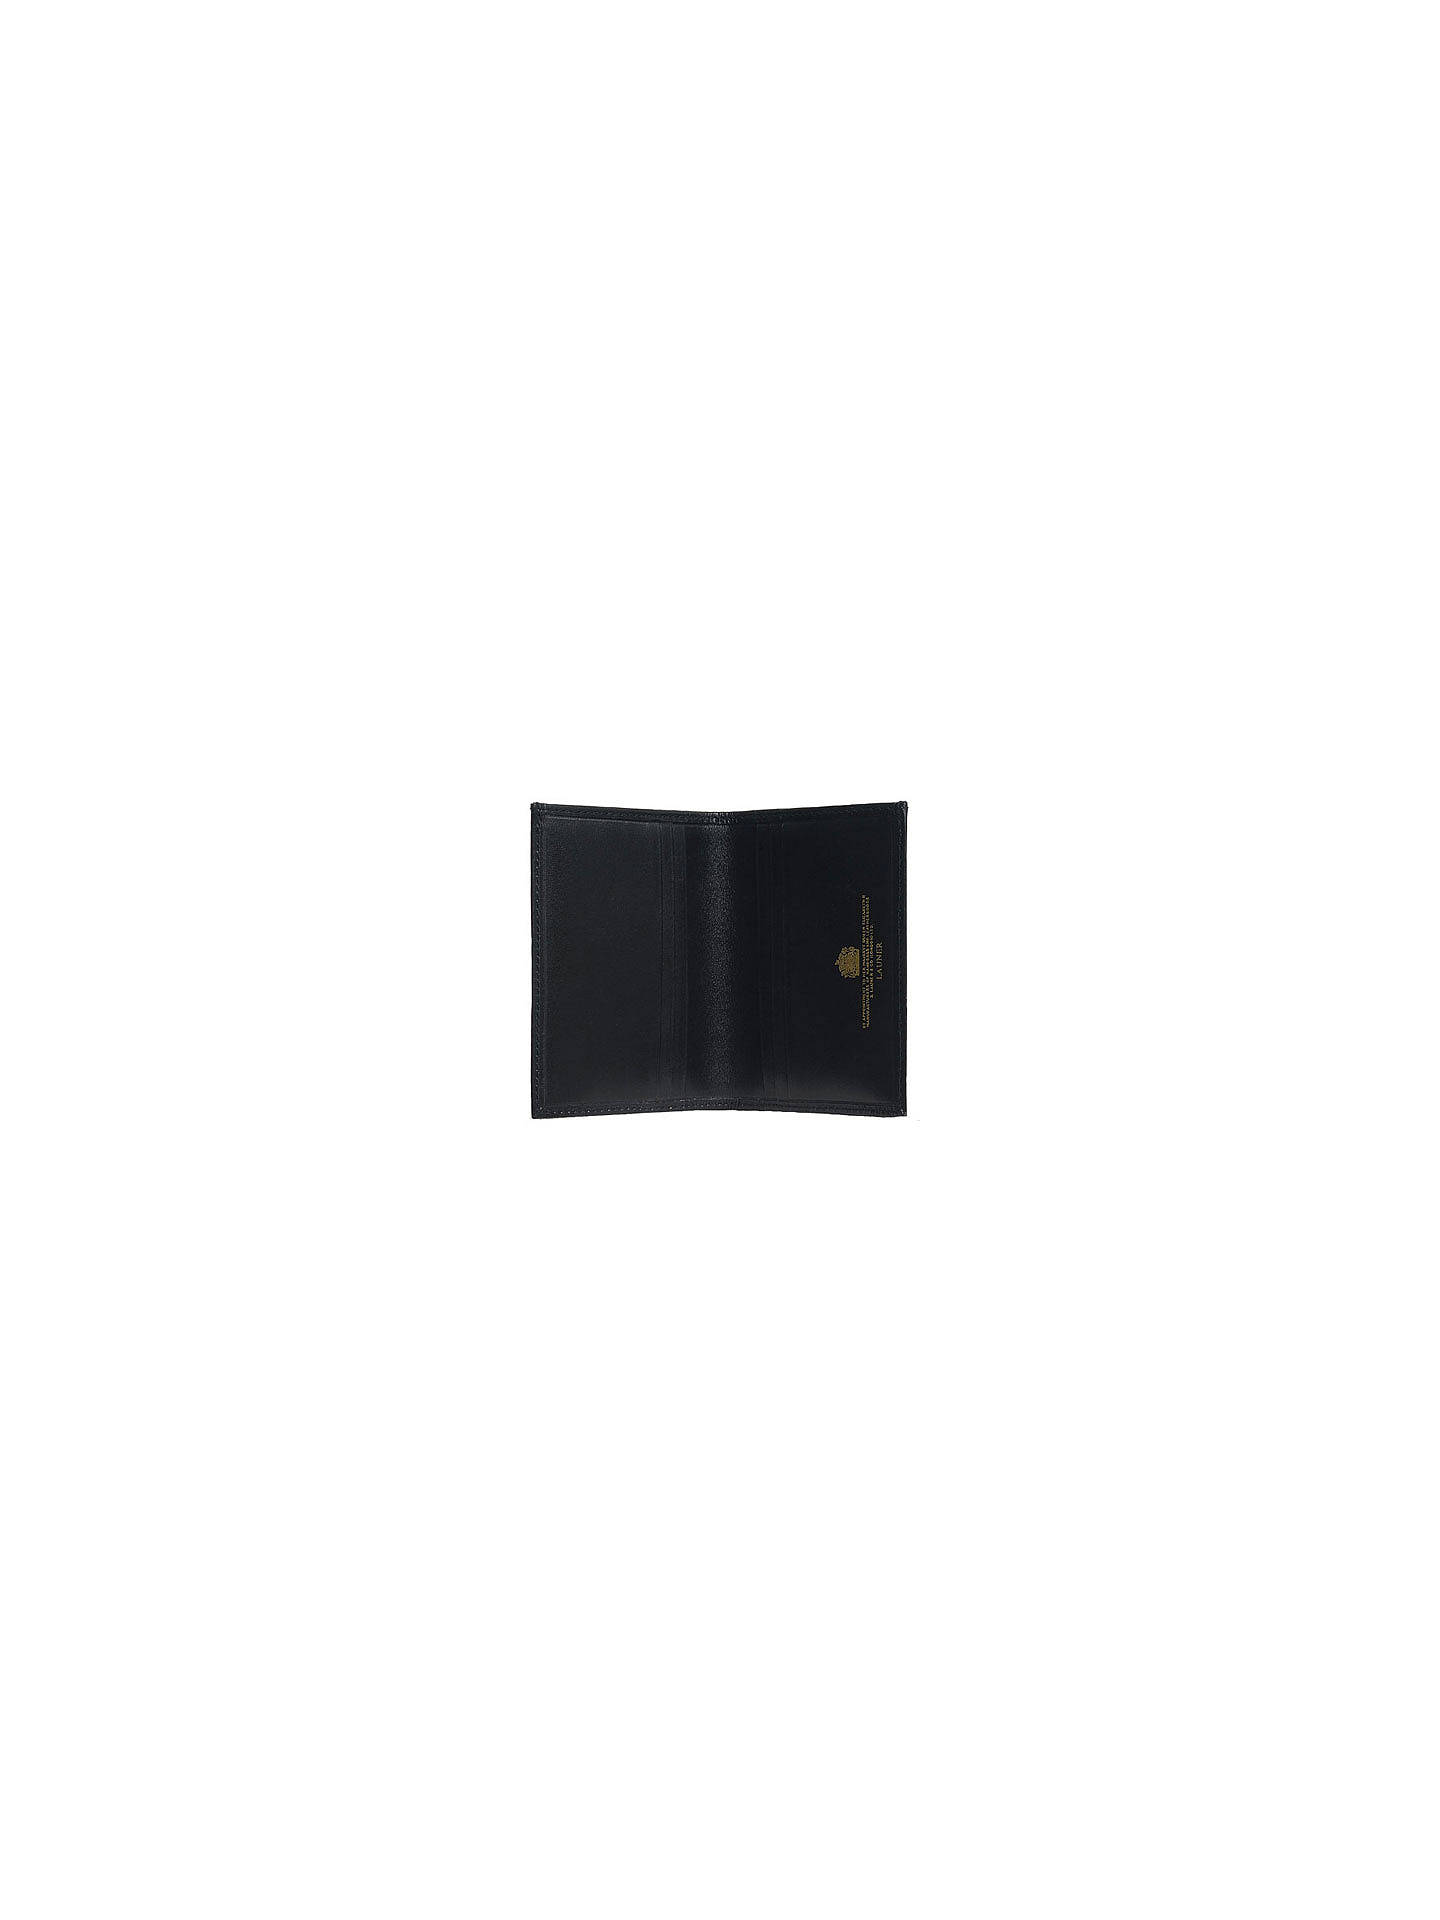 timeless design f4b5c b8d2f Launer Premium Leather Card Case, Black at John Lewis & Partners